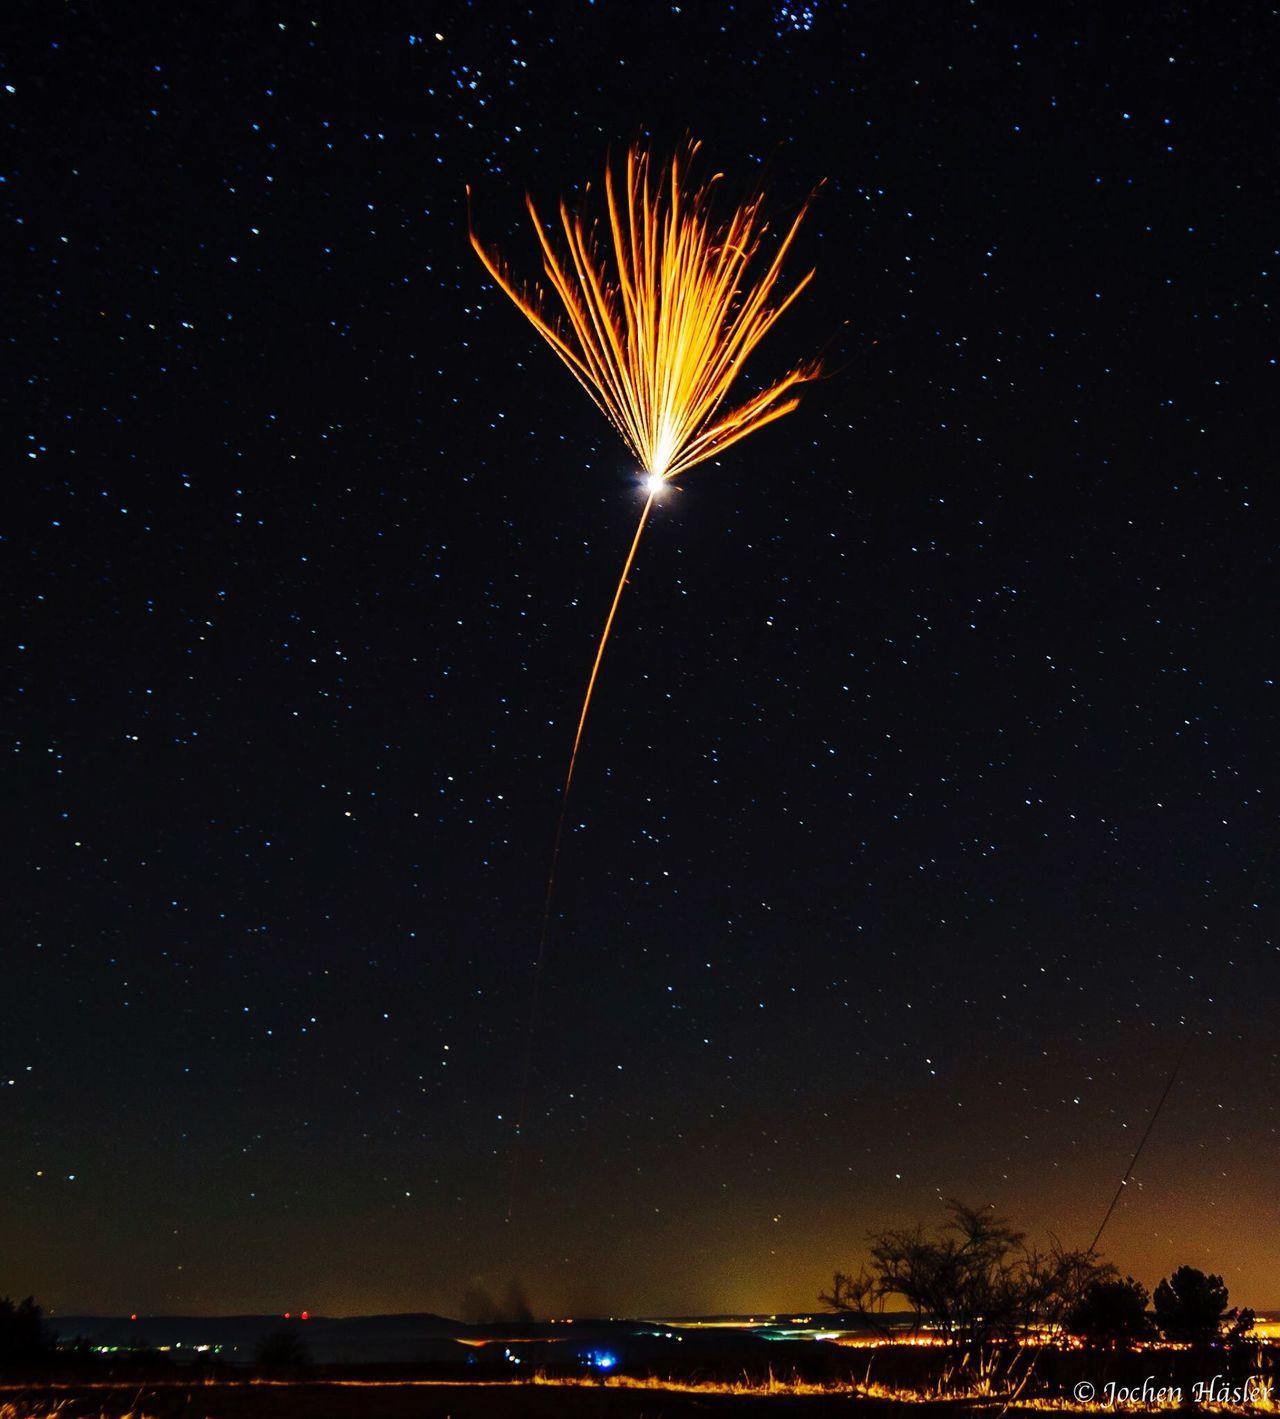 Perfekte Moment erwischt Feuerwerk Silvester Rakete Night Long Exposure Sky Outdoors Langzeitbelichtung Sony Sonyalpha Ilce-7m2 ILCE7M2 Sirui Sonya7II Alpha7m2 Alpha7 Sonyalpha7ii Sternenhimmel Stars Nacht Dunkel Dark Denkingen Klippeneck